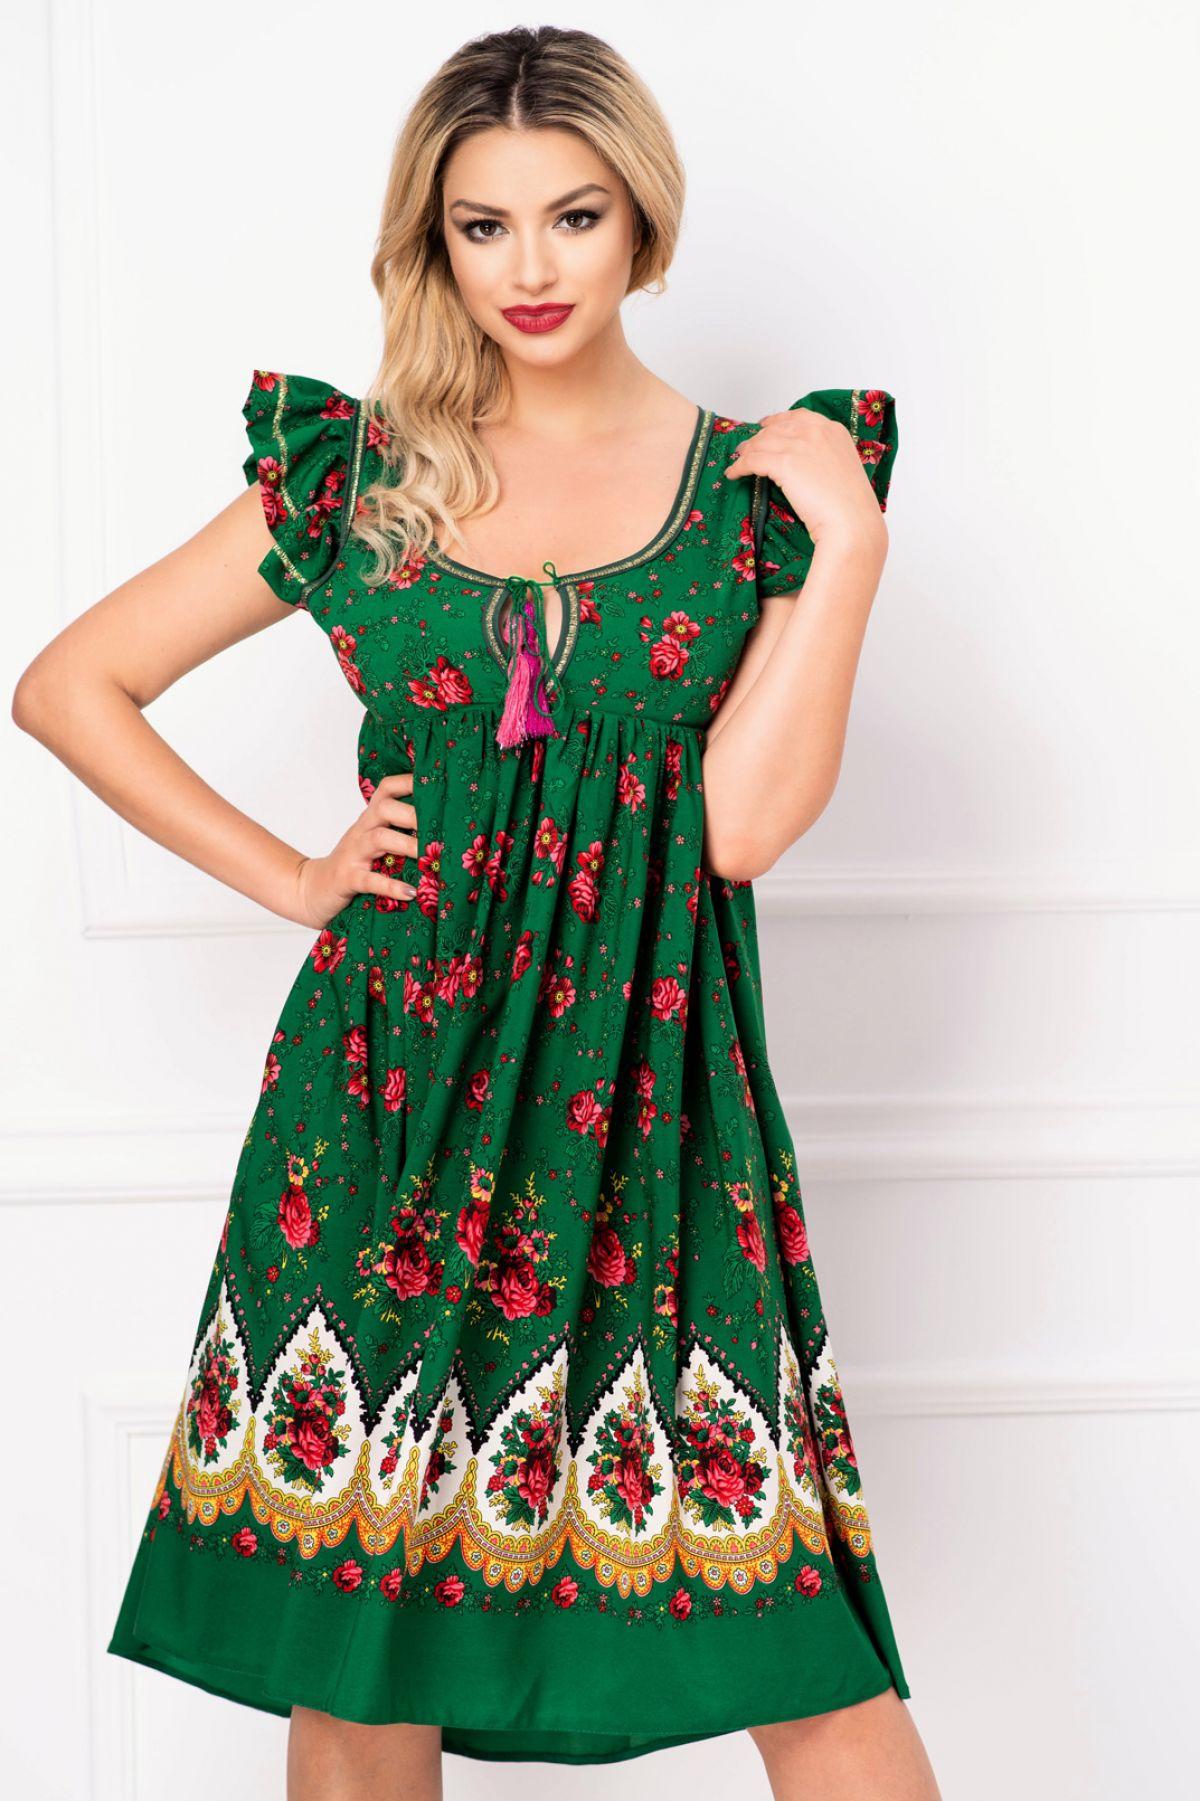 Rochie Venezia lejera verde cu decupaj la spate si imprimeu floral Venezia-Artigiano-Moda